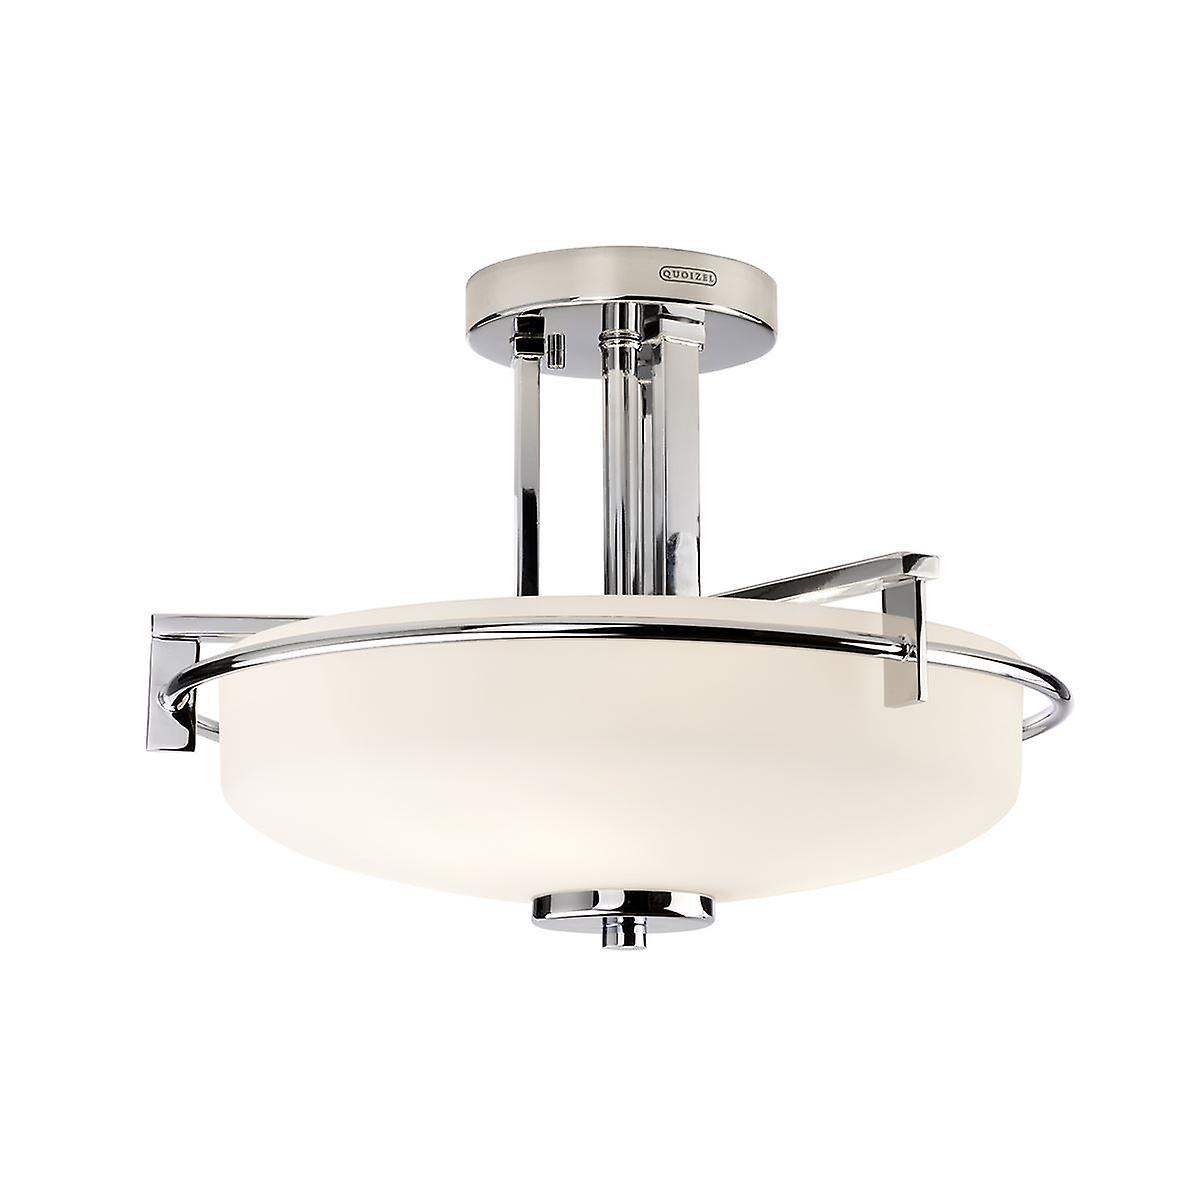 Elstead - 3 lumière Semi Flush lumière - Polished Chrome Finish - QZ TAYLOR SFBATH